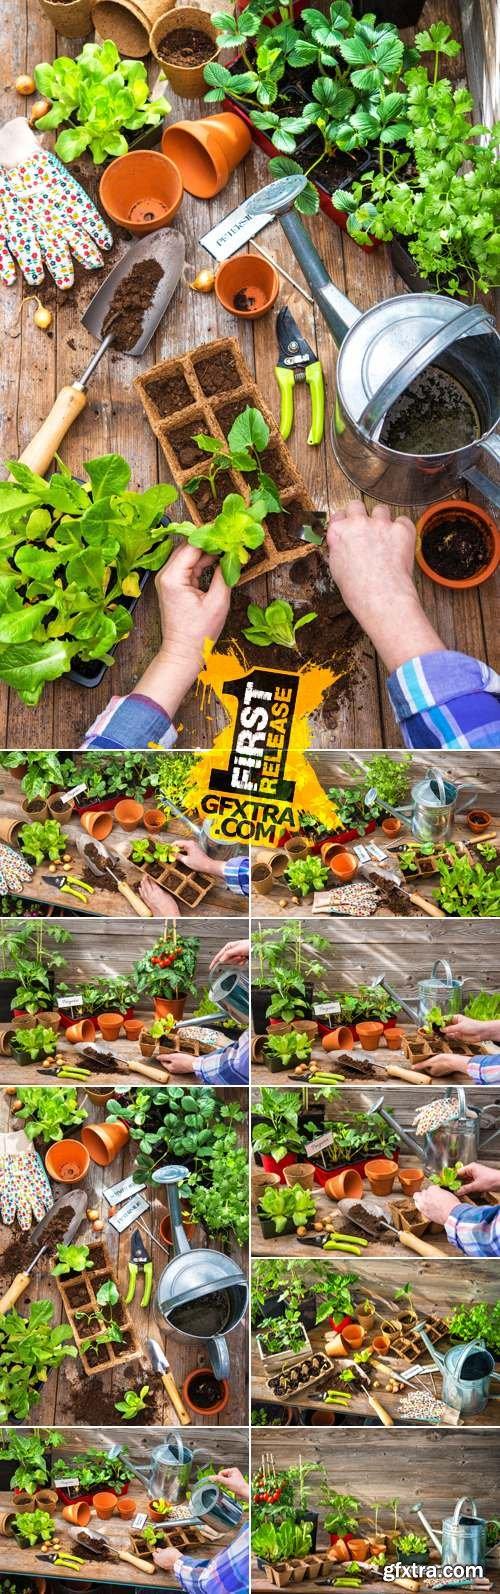 Stock Photo - Planting Seedlings